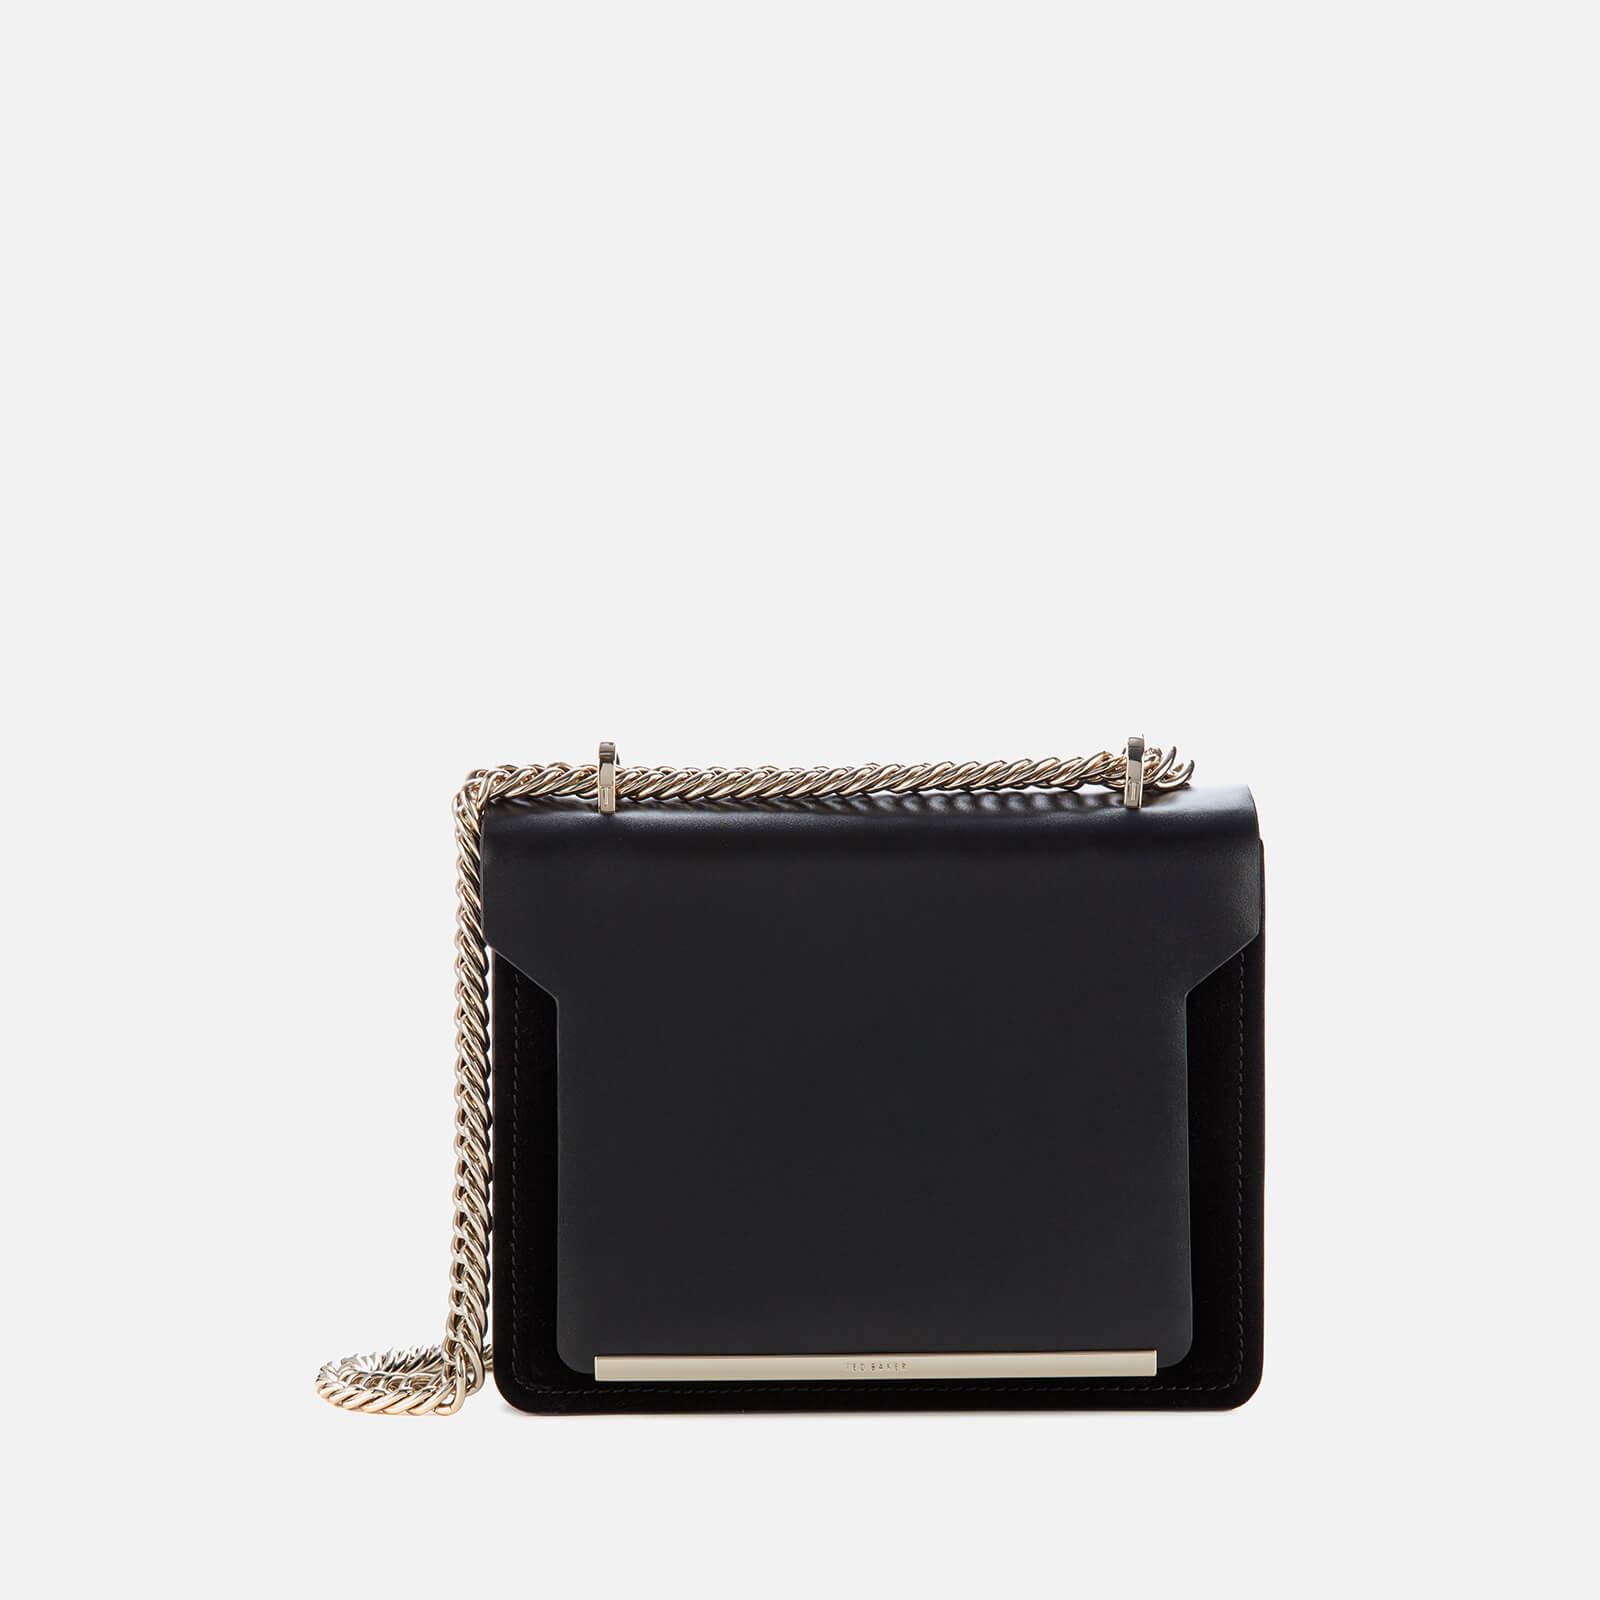 Ted Baker Women's Ameniaa Slim Bar Detail Cross Body Bag - Black 原價159英鎊 優惠價80